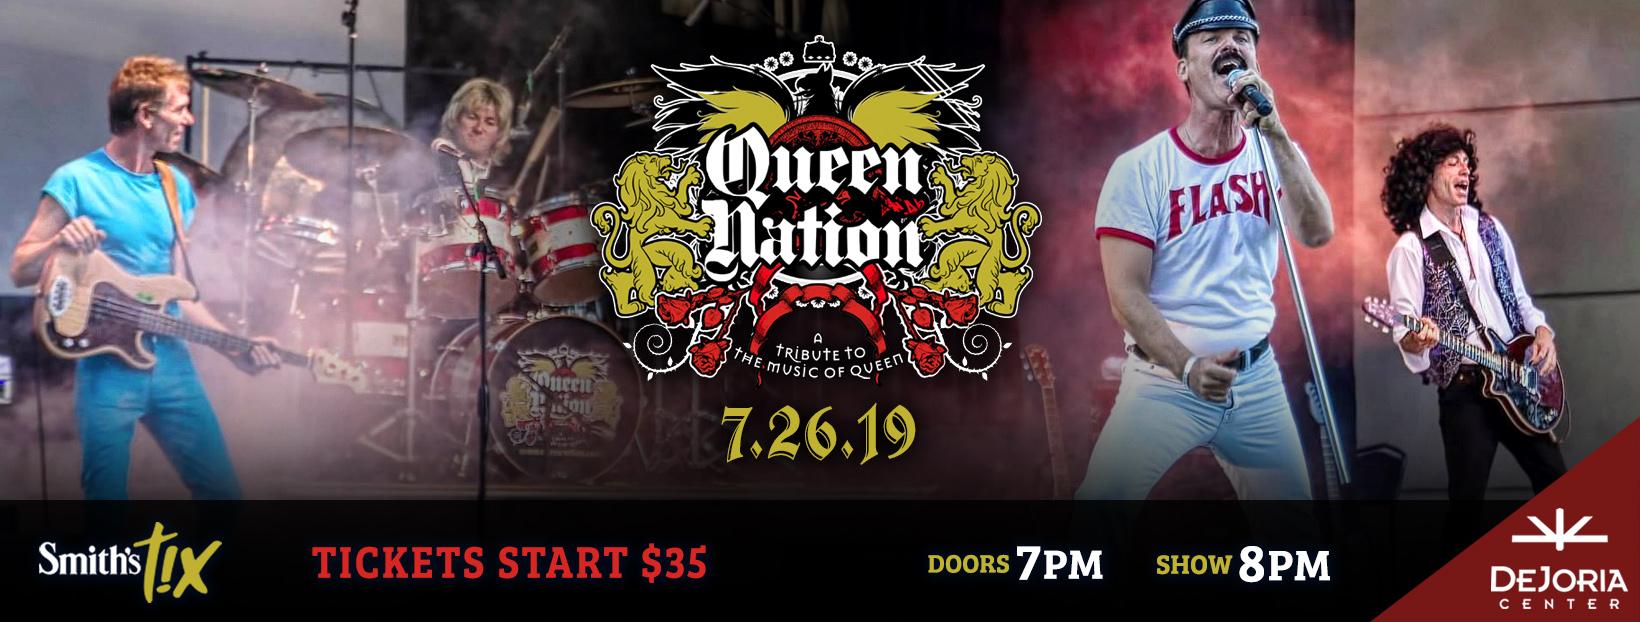 DJC - Queen Nation Facebook Banner